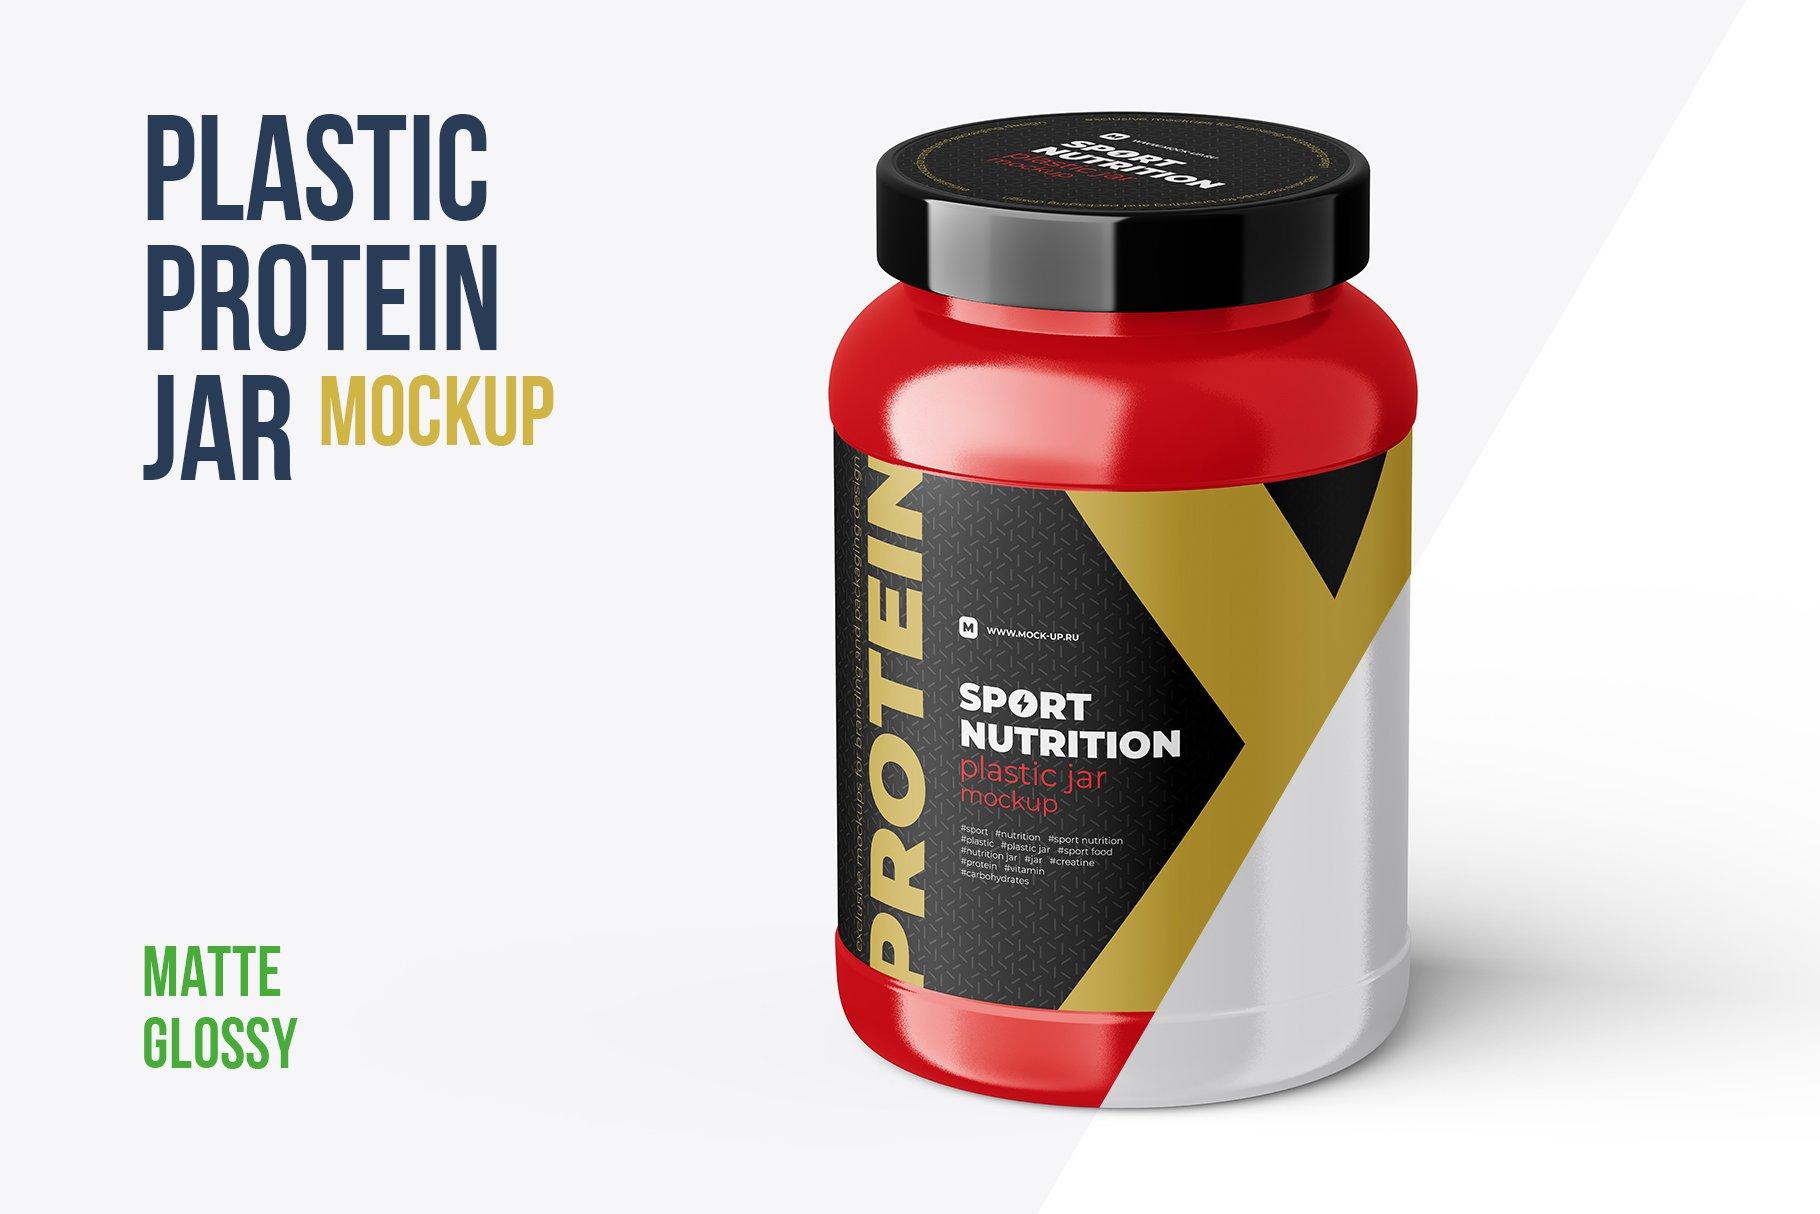 运动营养品果酱塑料罐标签设计展示样机模板 Sport Nutrition Plastic Jar Mockup插图